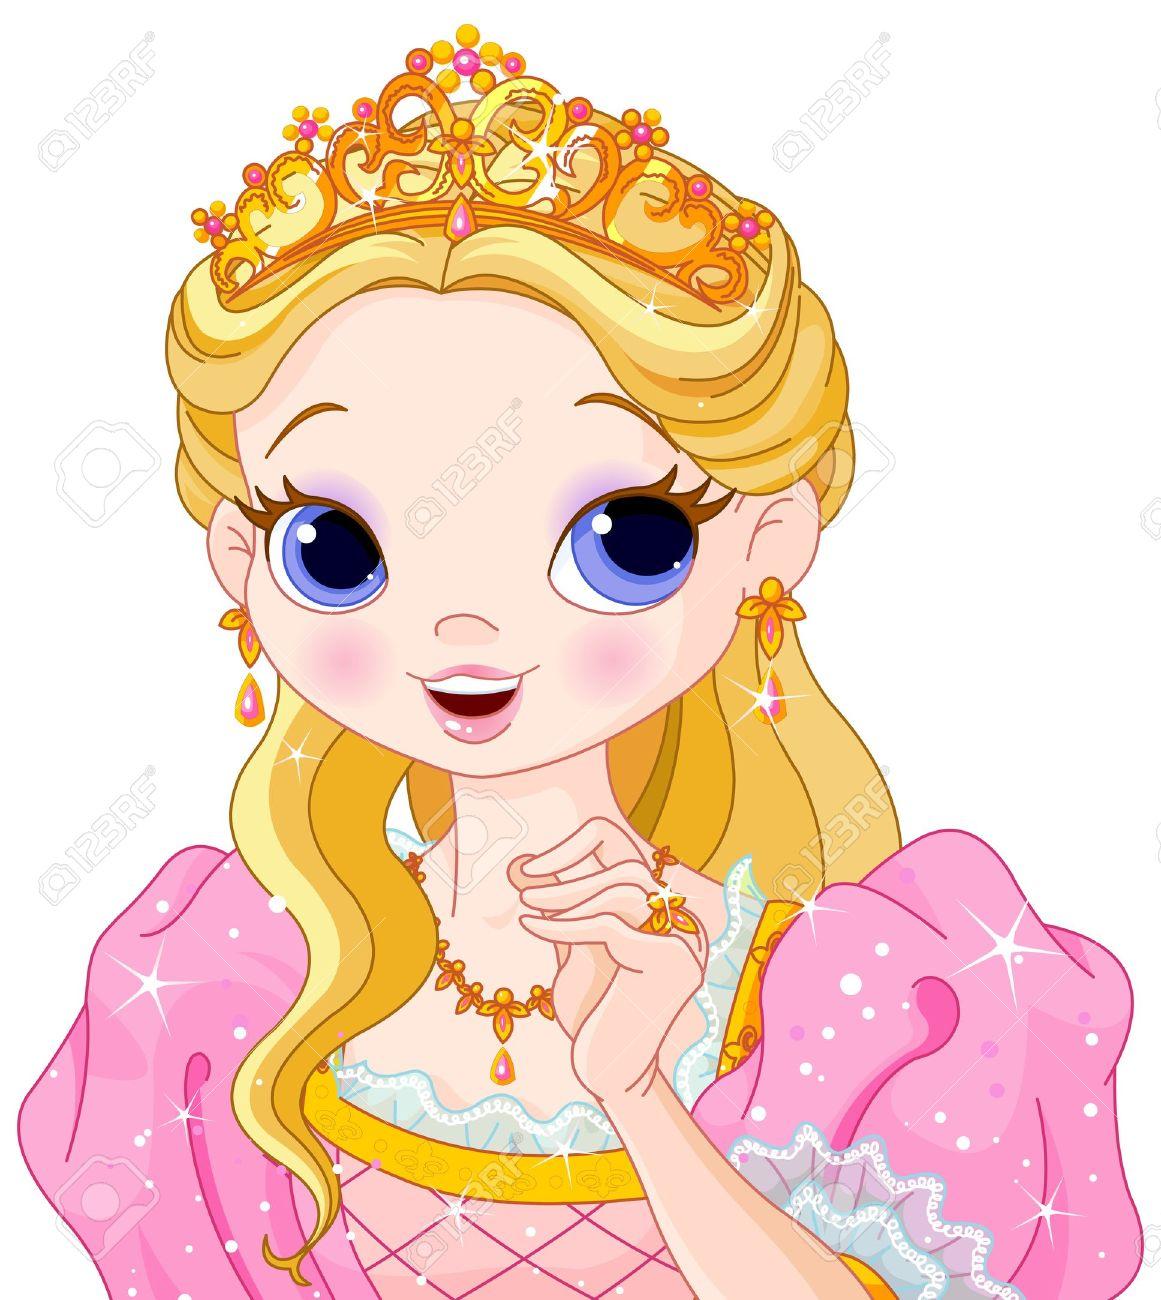 Illustration of beautiful fairytale princess Stock Vector - 19095819